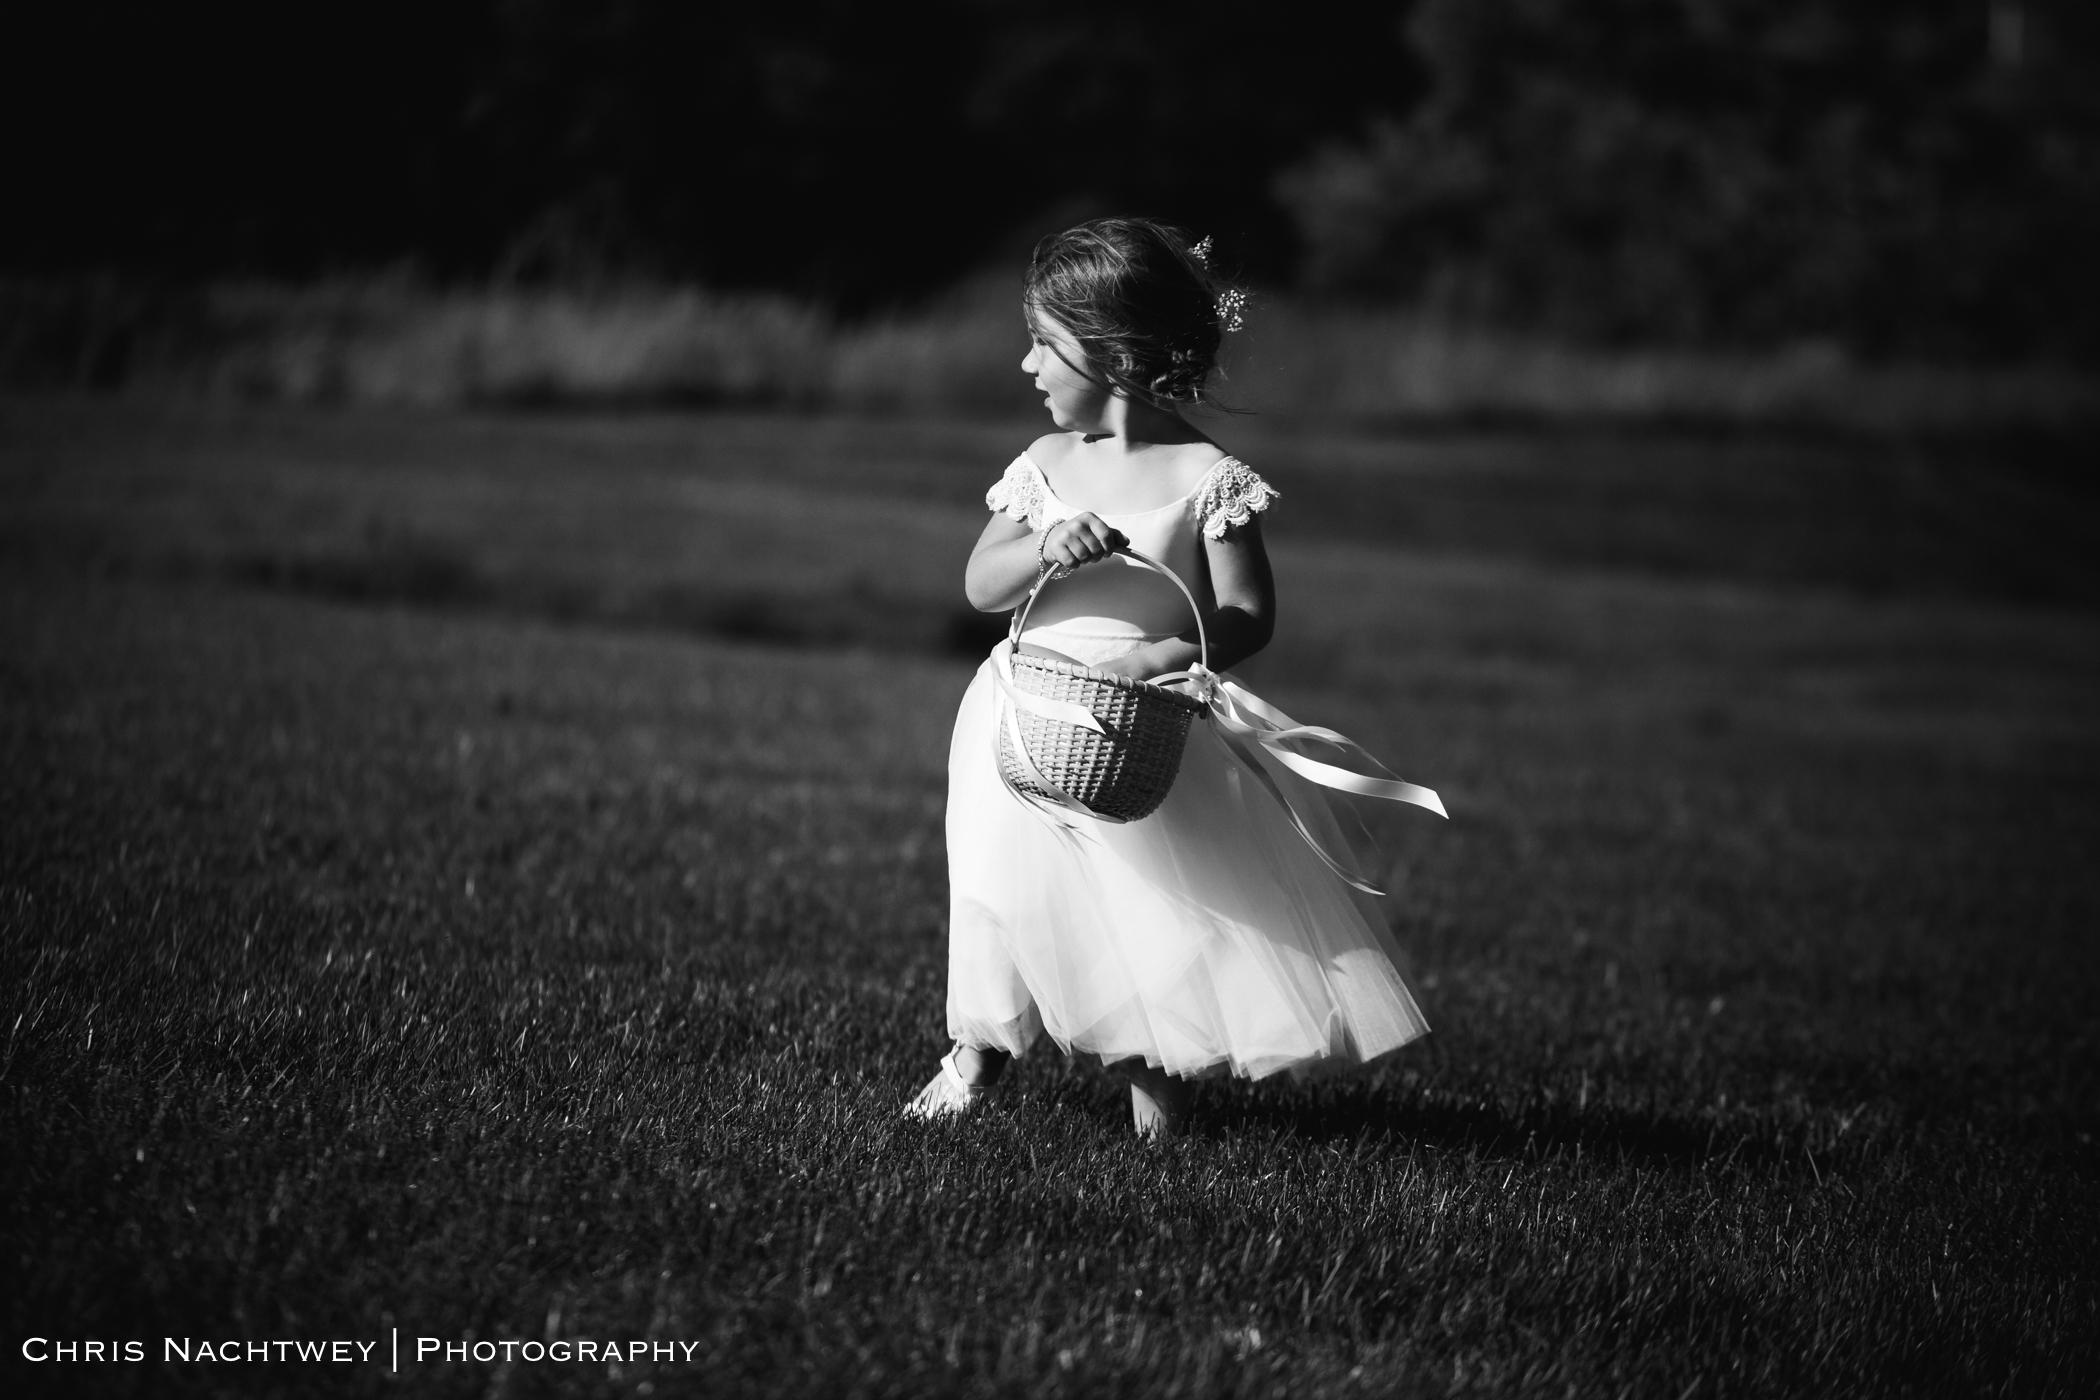 artistic-ct-wedding-photographers-chris-nachtwey-2017-102.jpg